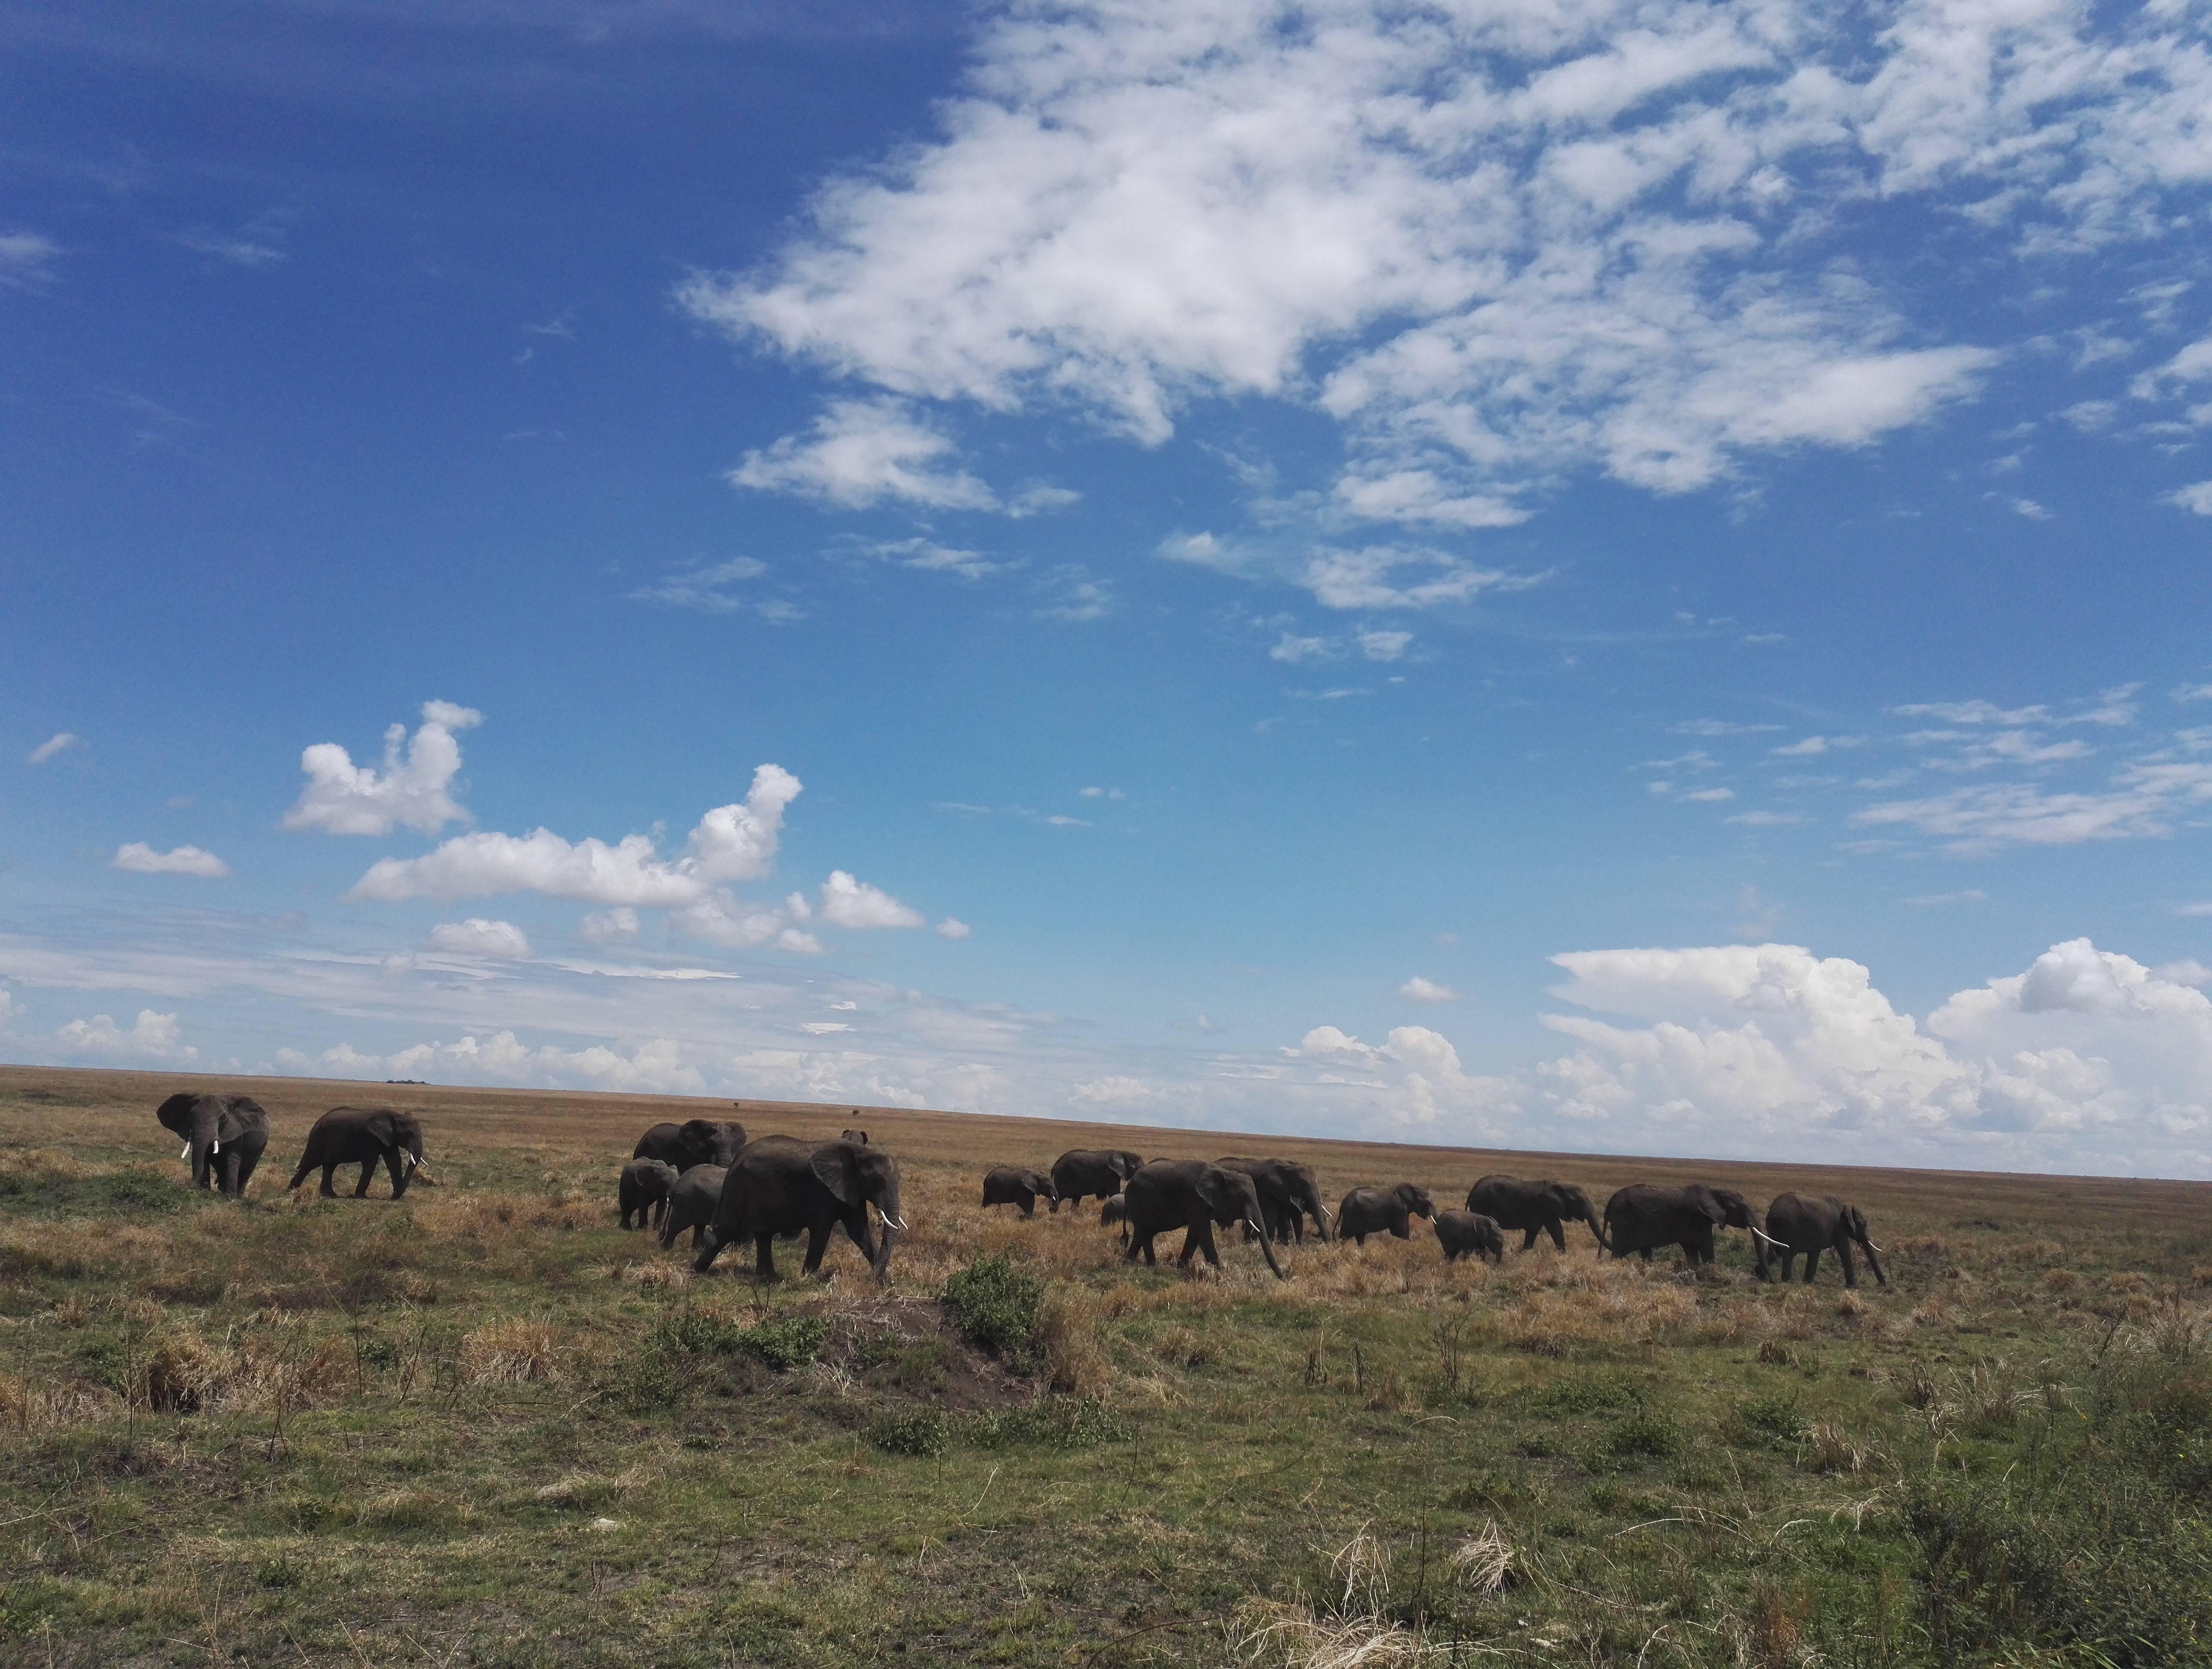 Photo 1: Parc national serengeti